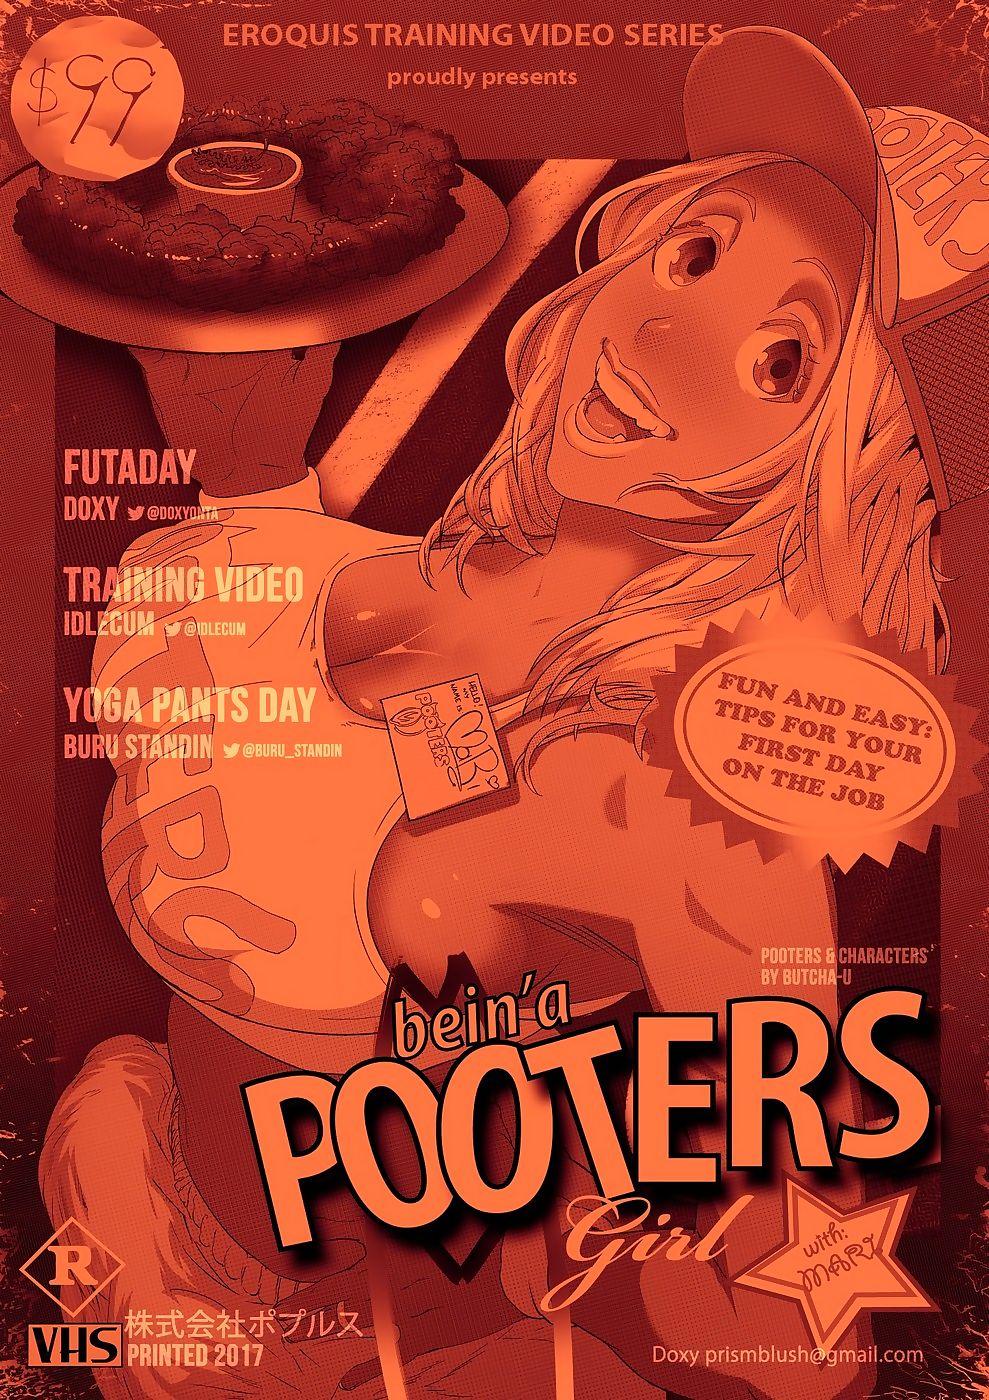 Doxy- Pooters Futaday